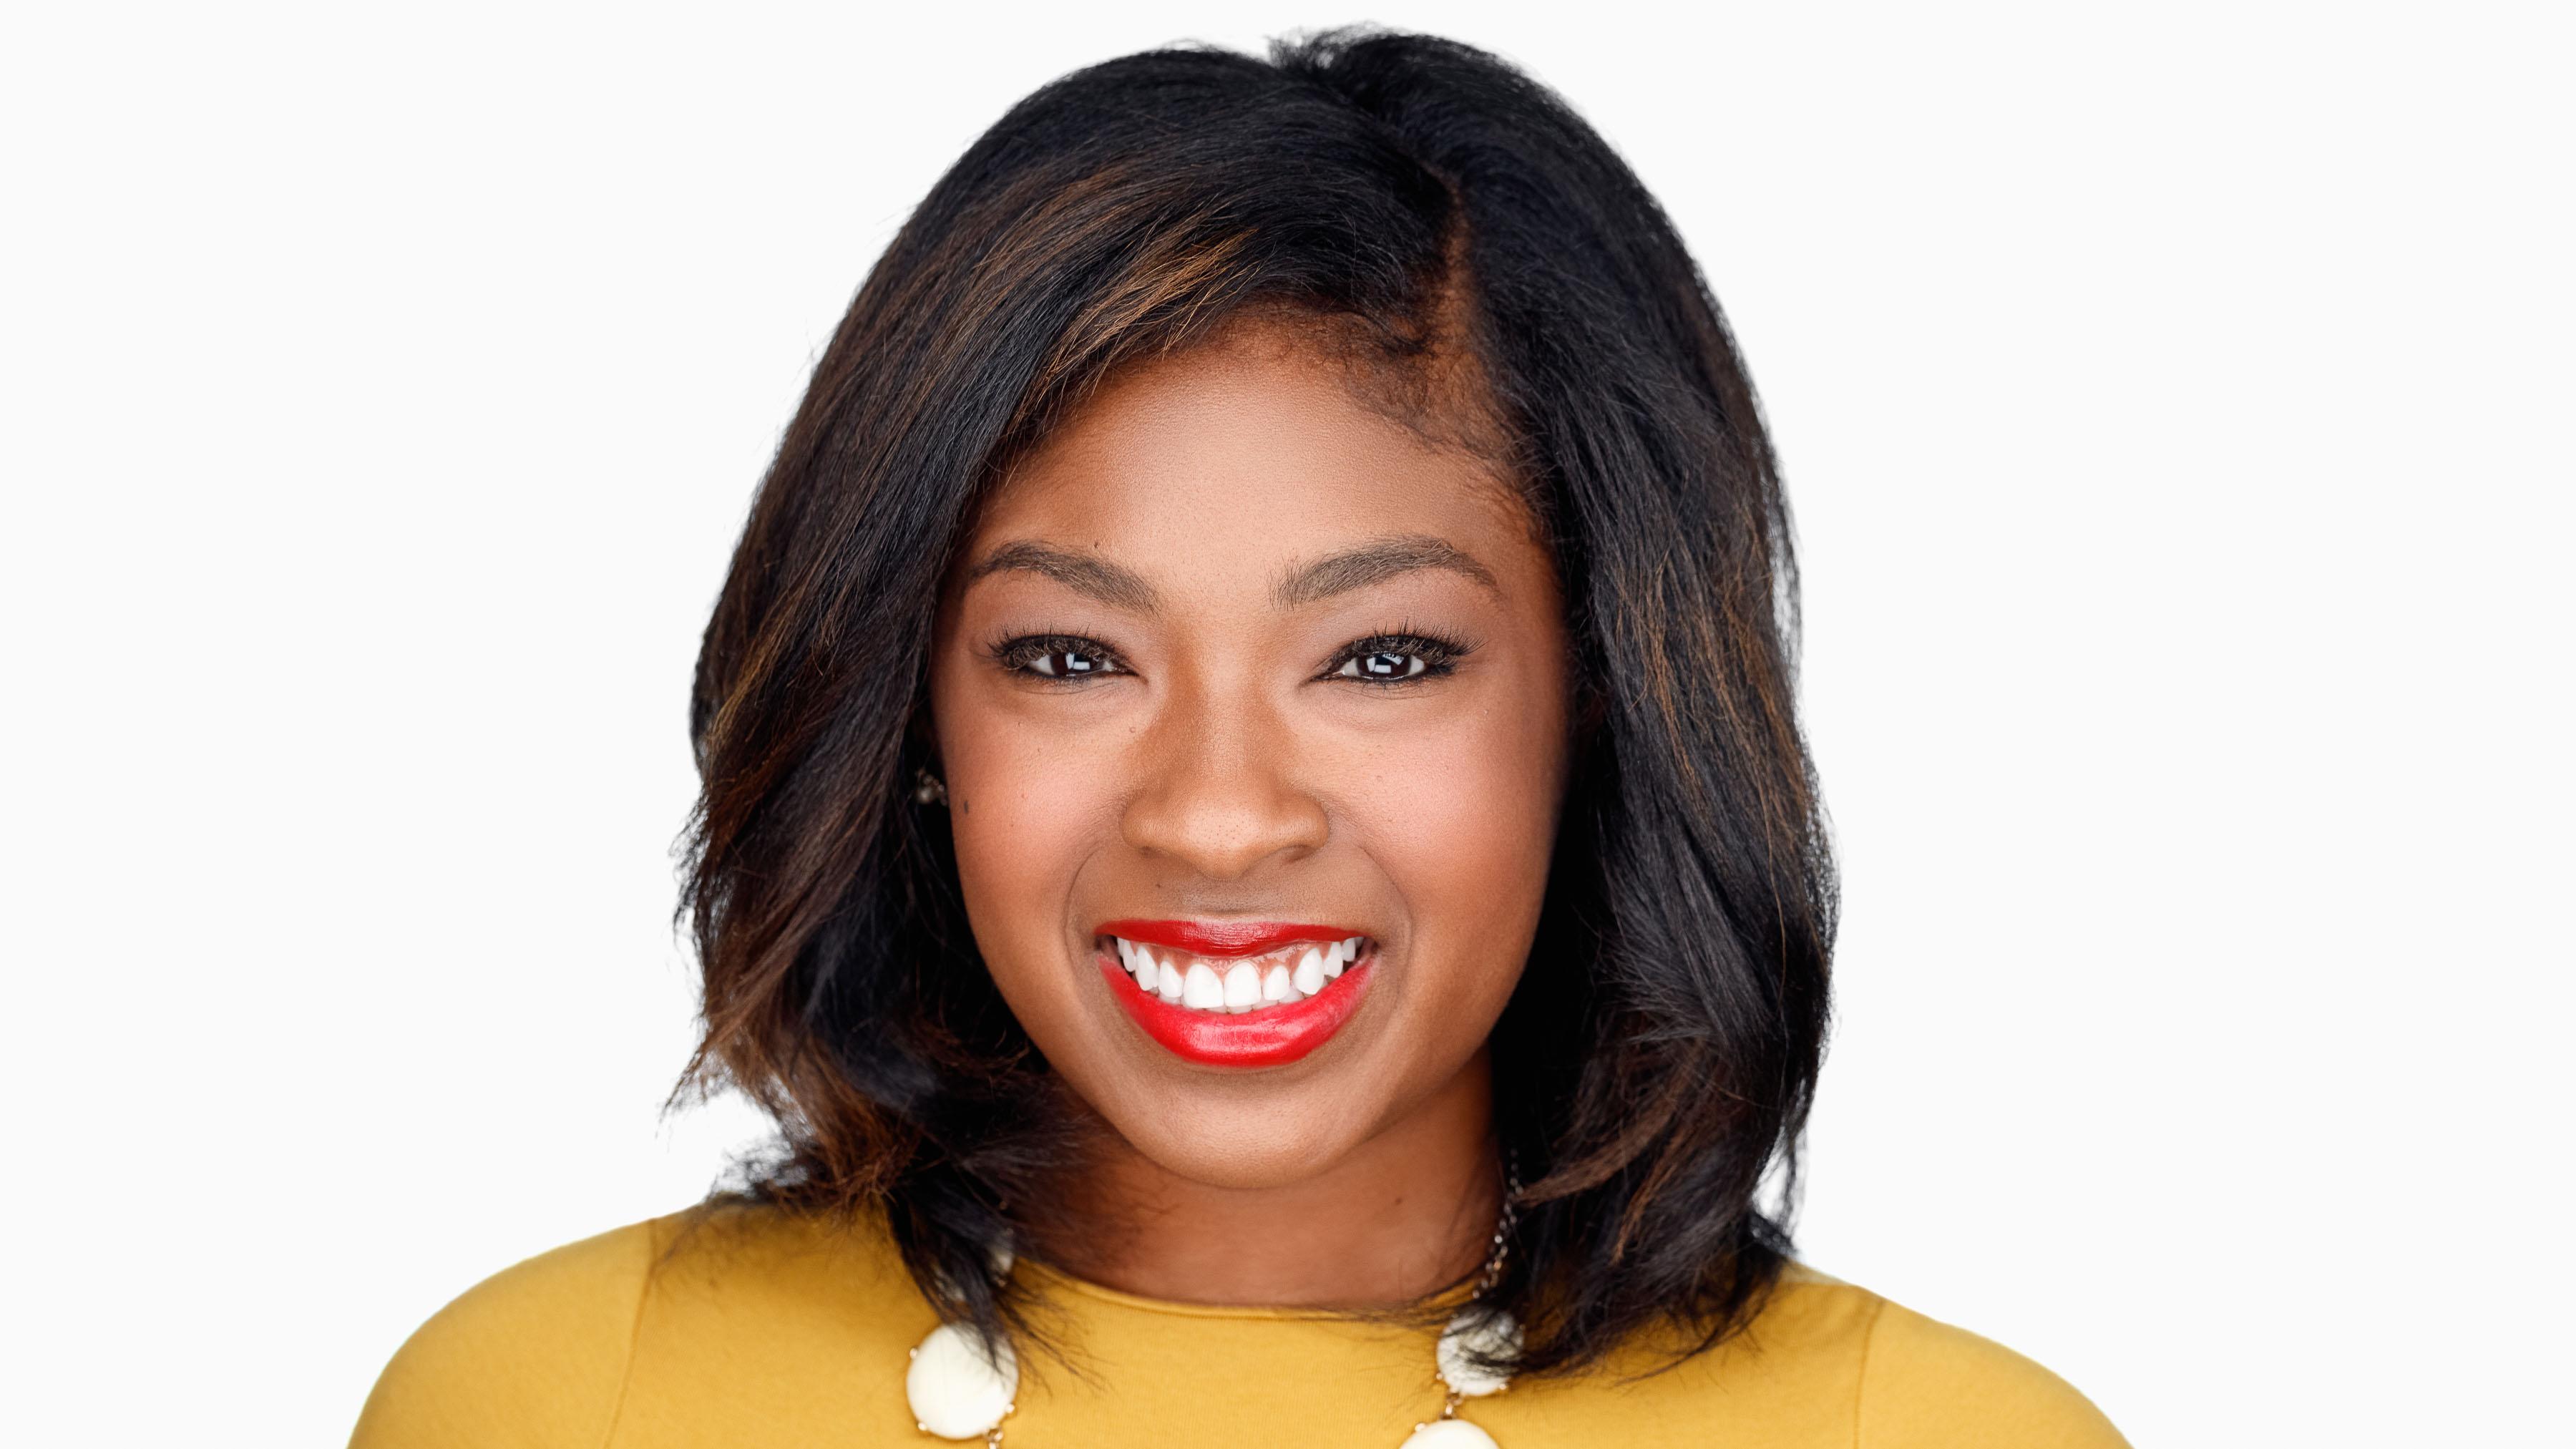 Chloe Alexander